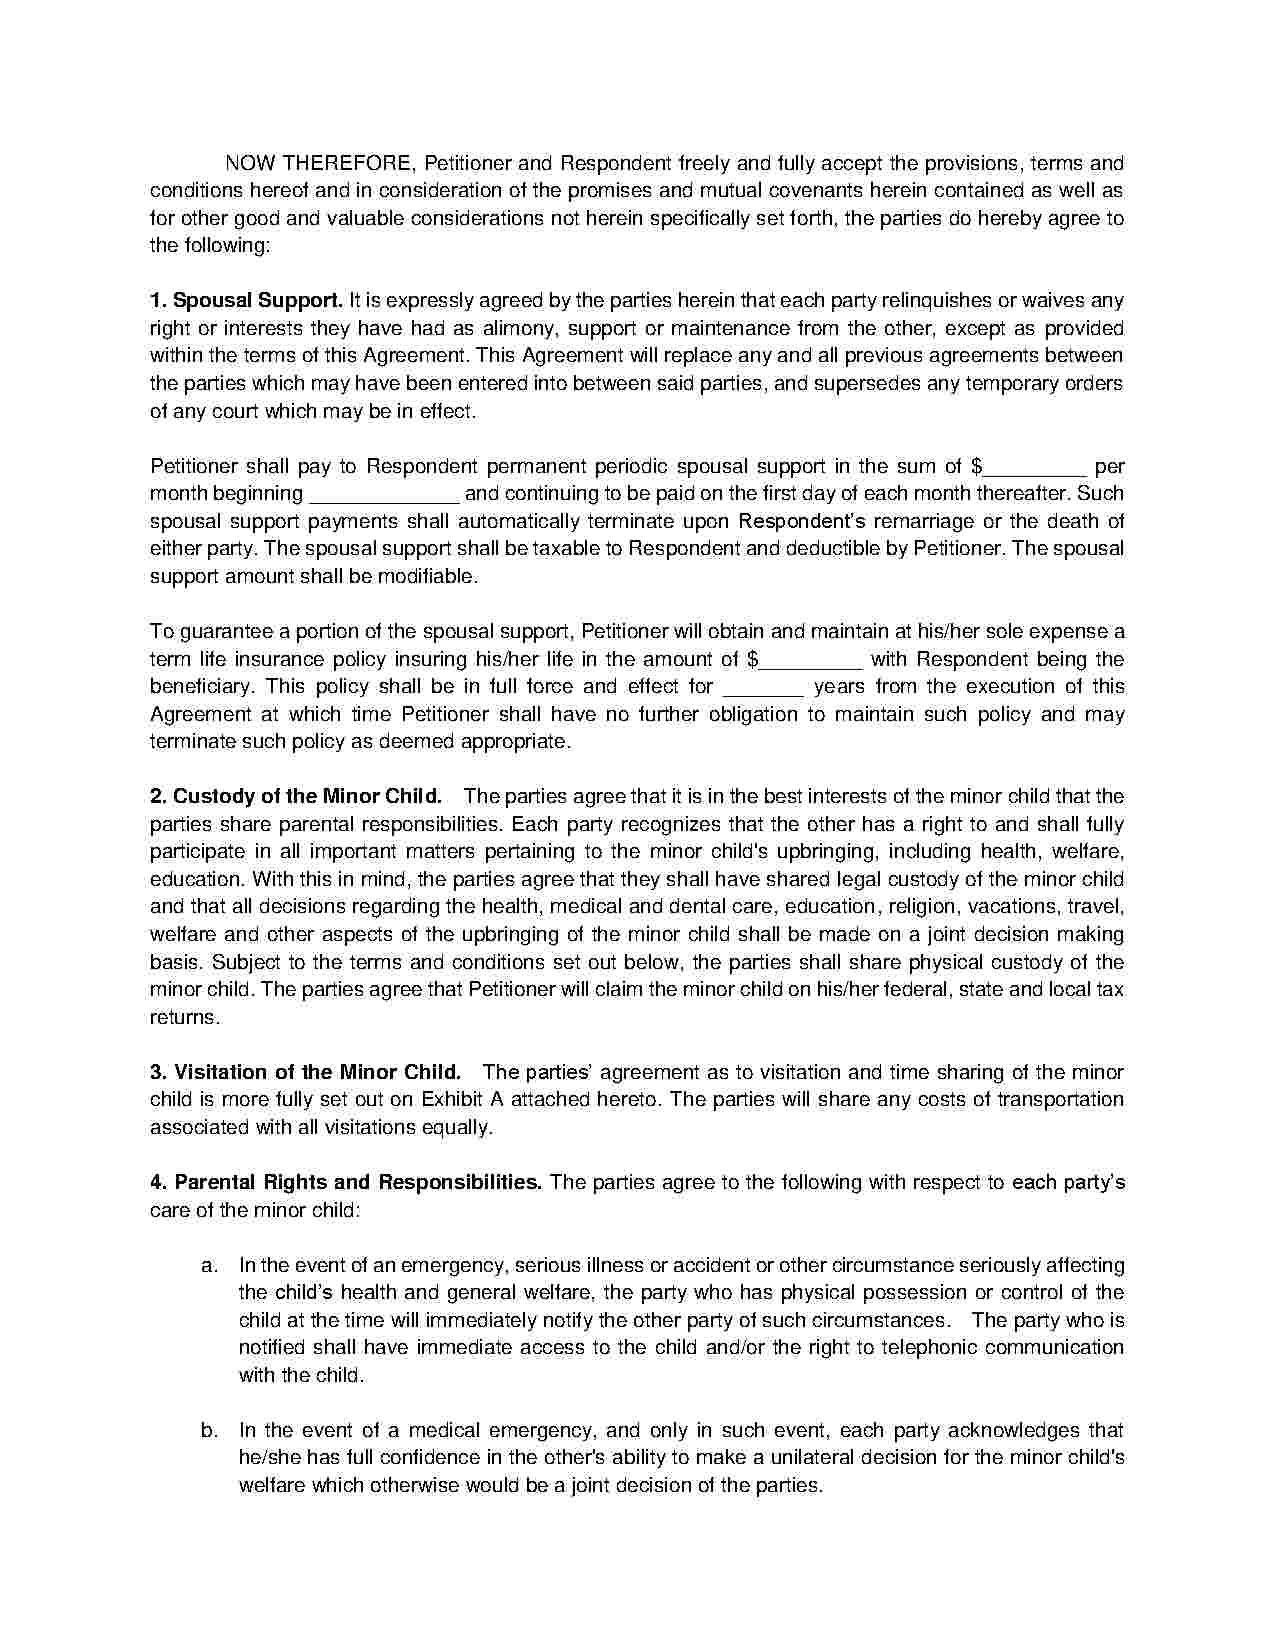 Divorce Mediation Agreement Template